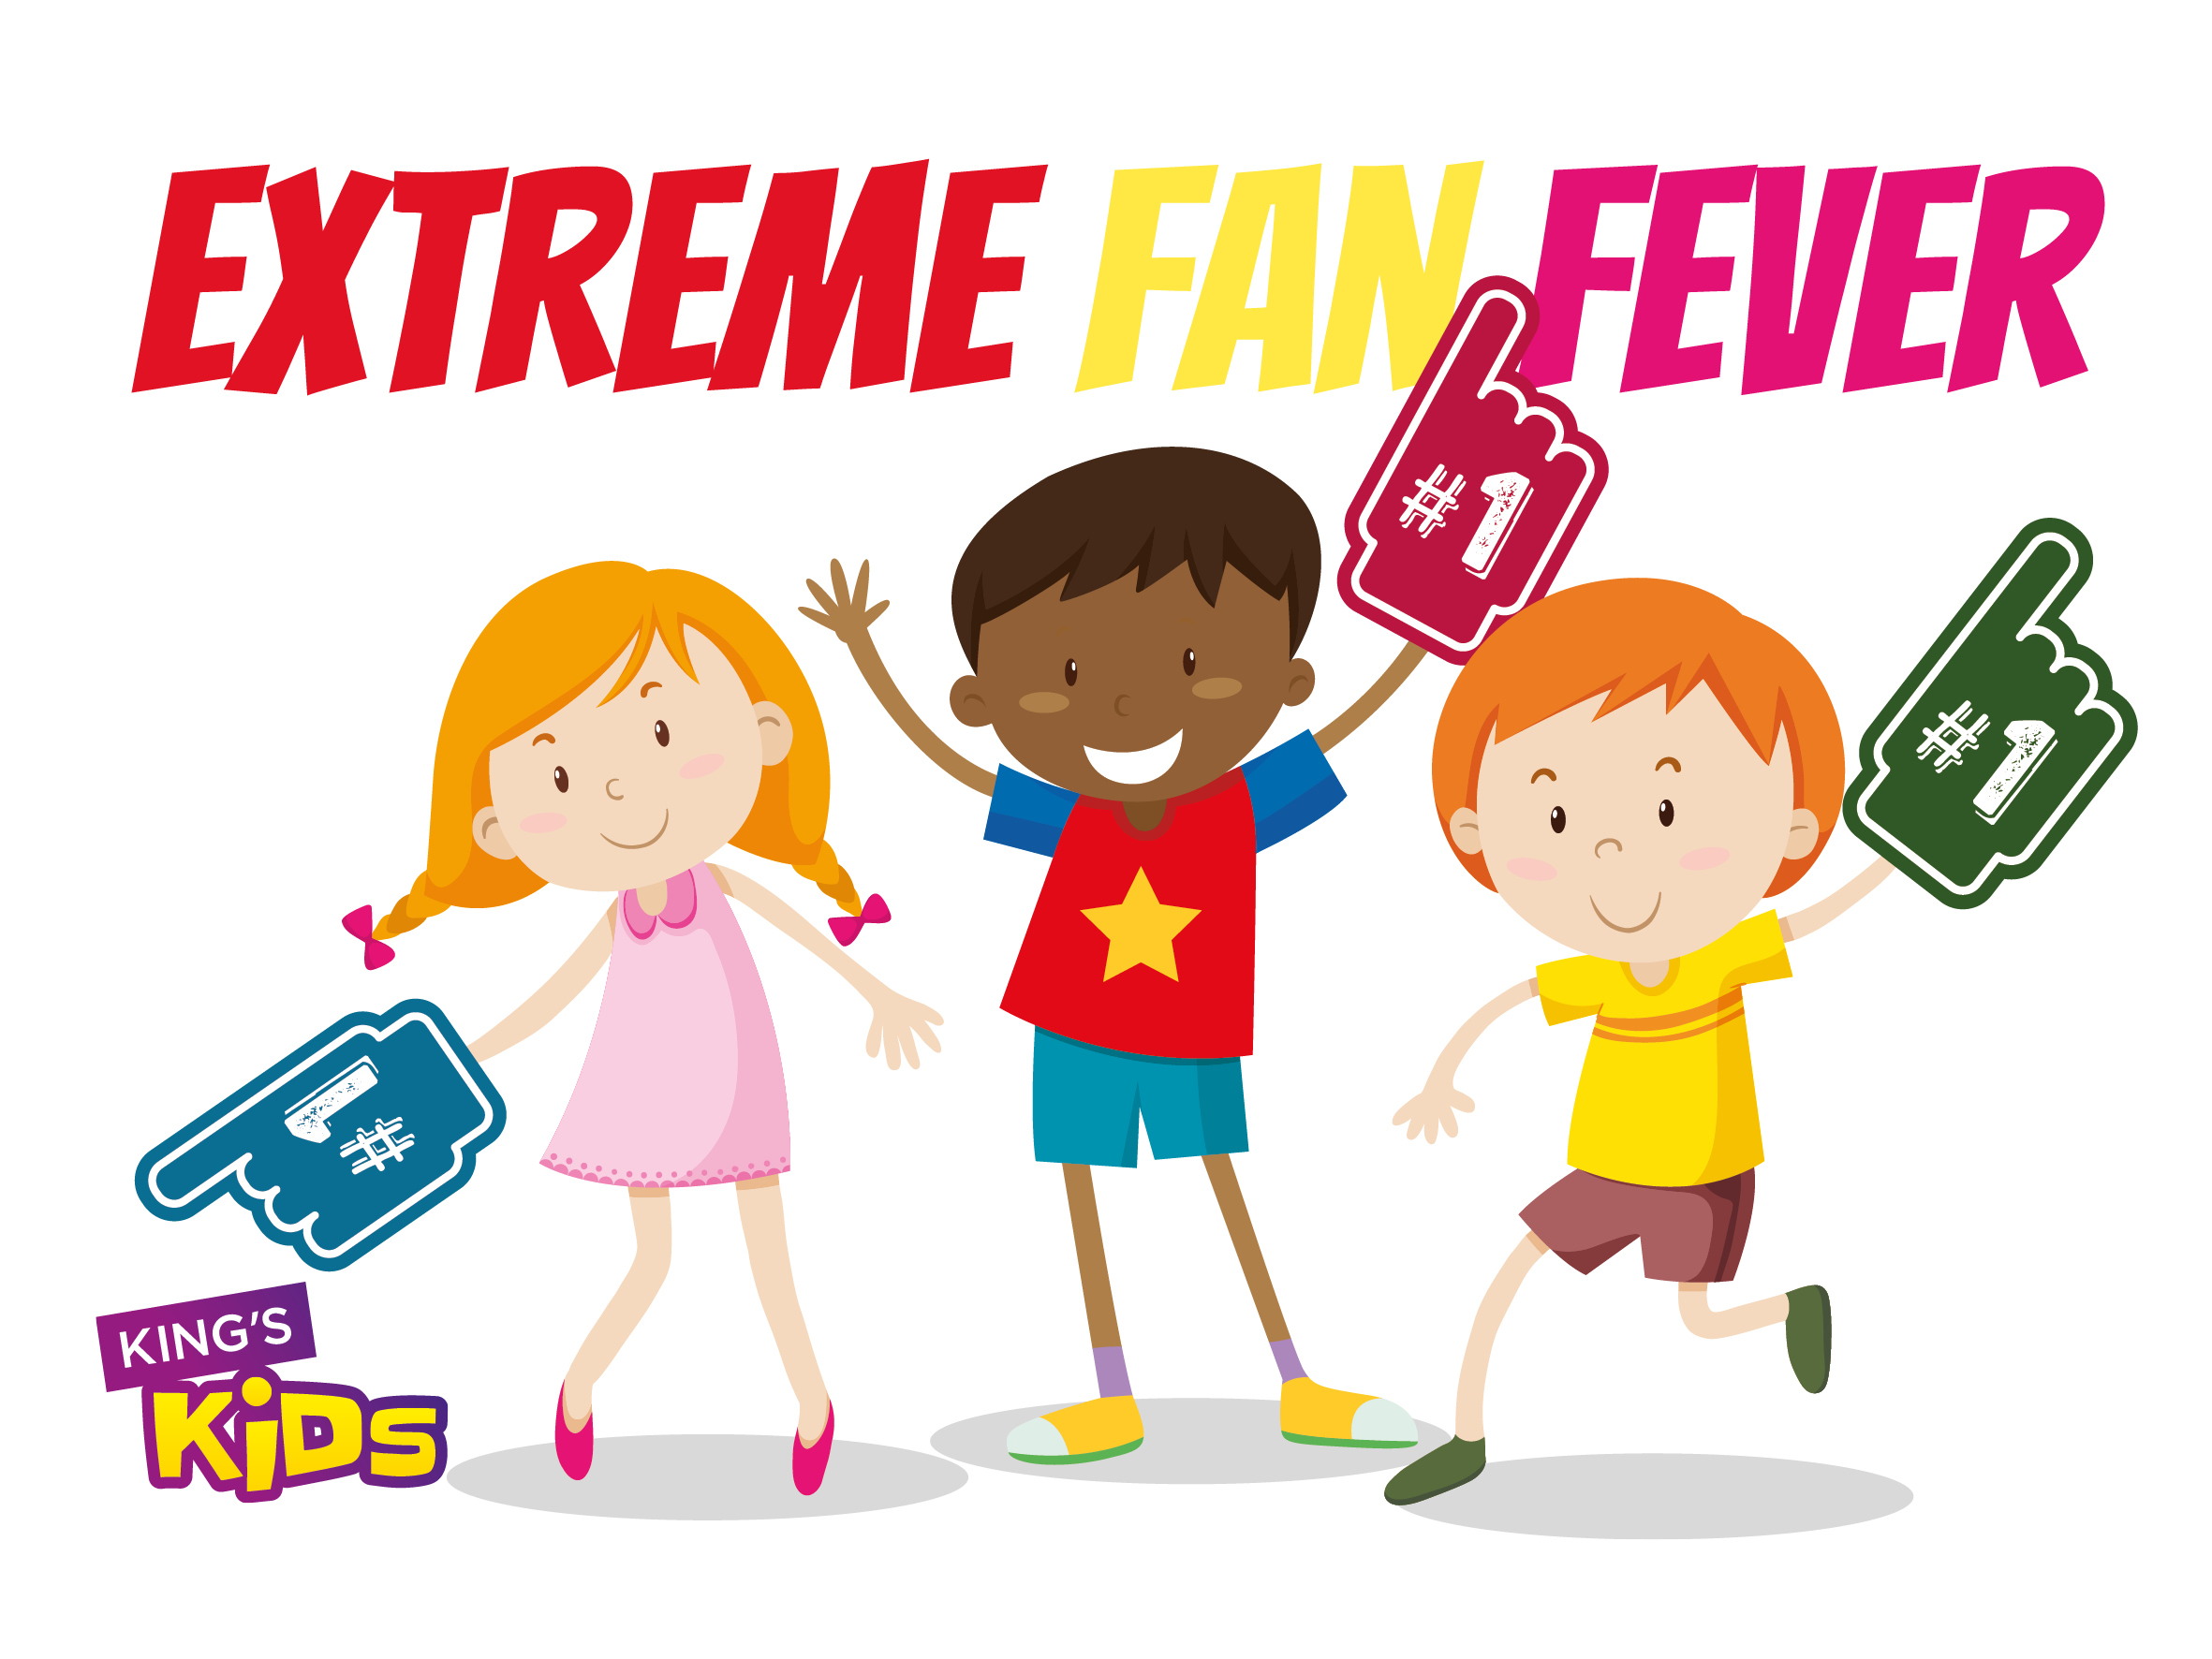 Kings_KC_Kids_ExtremeFanFever_WebGraphic.jpg